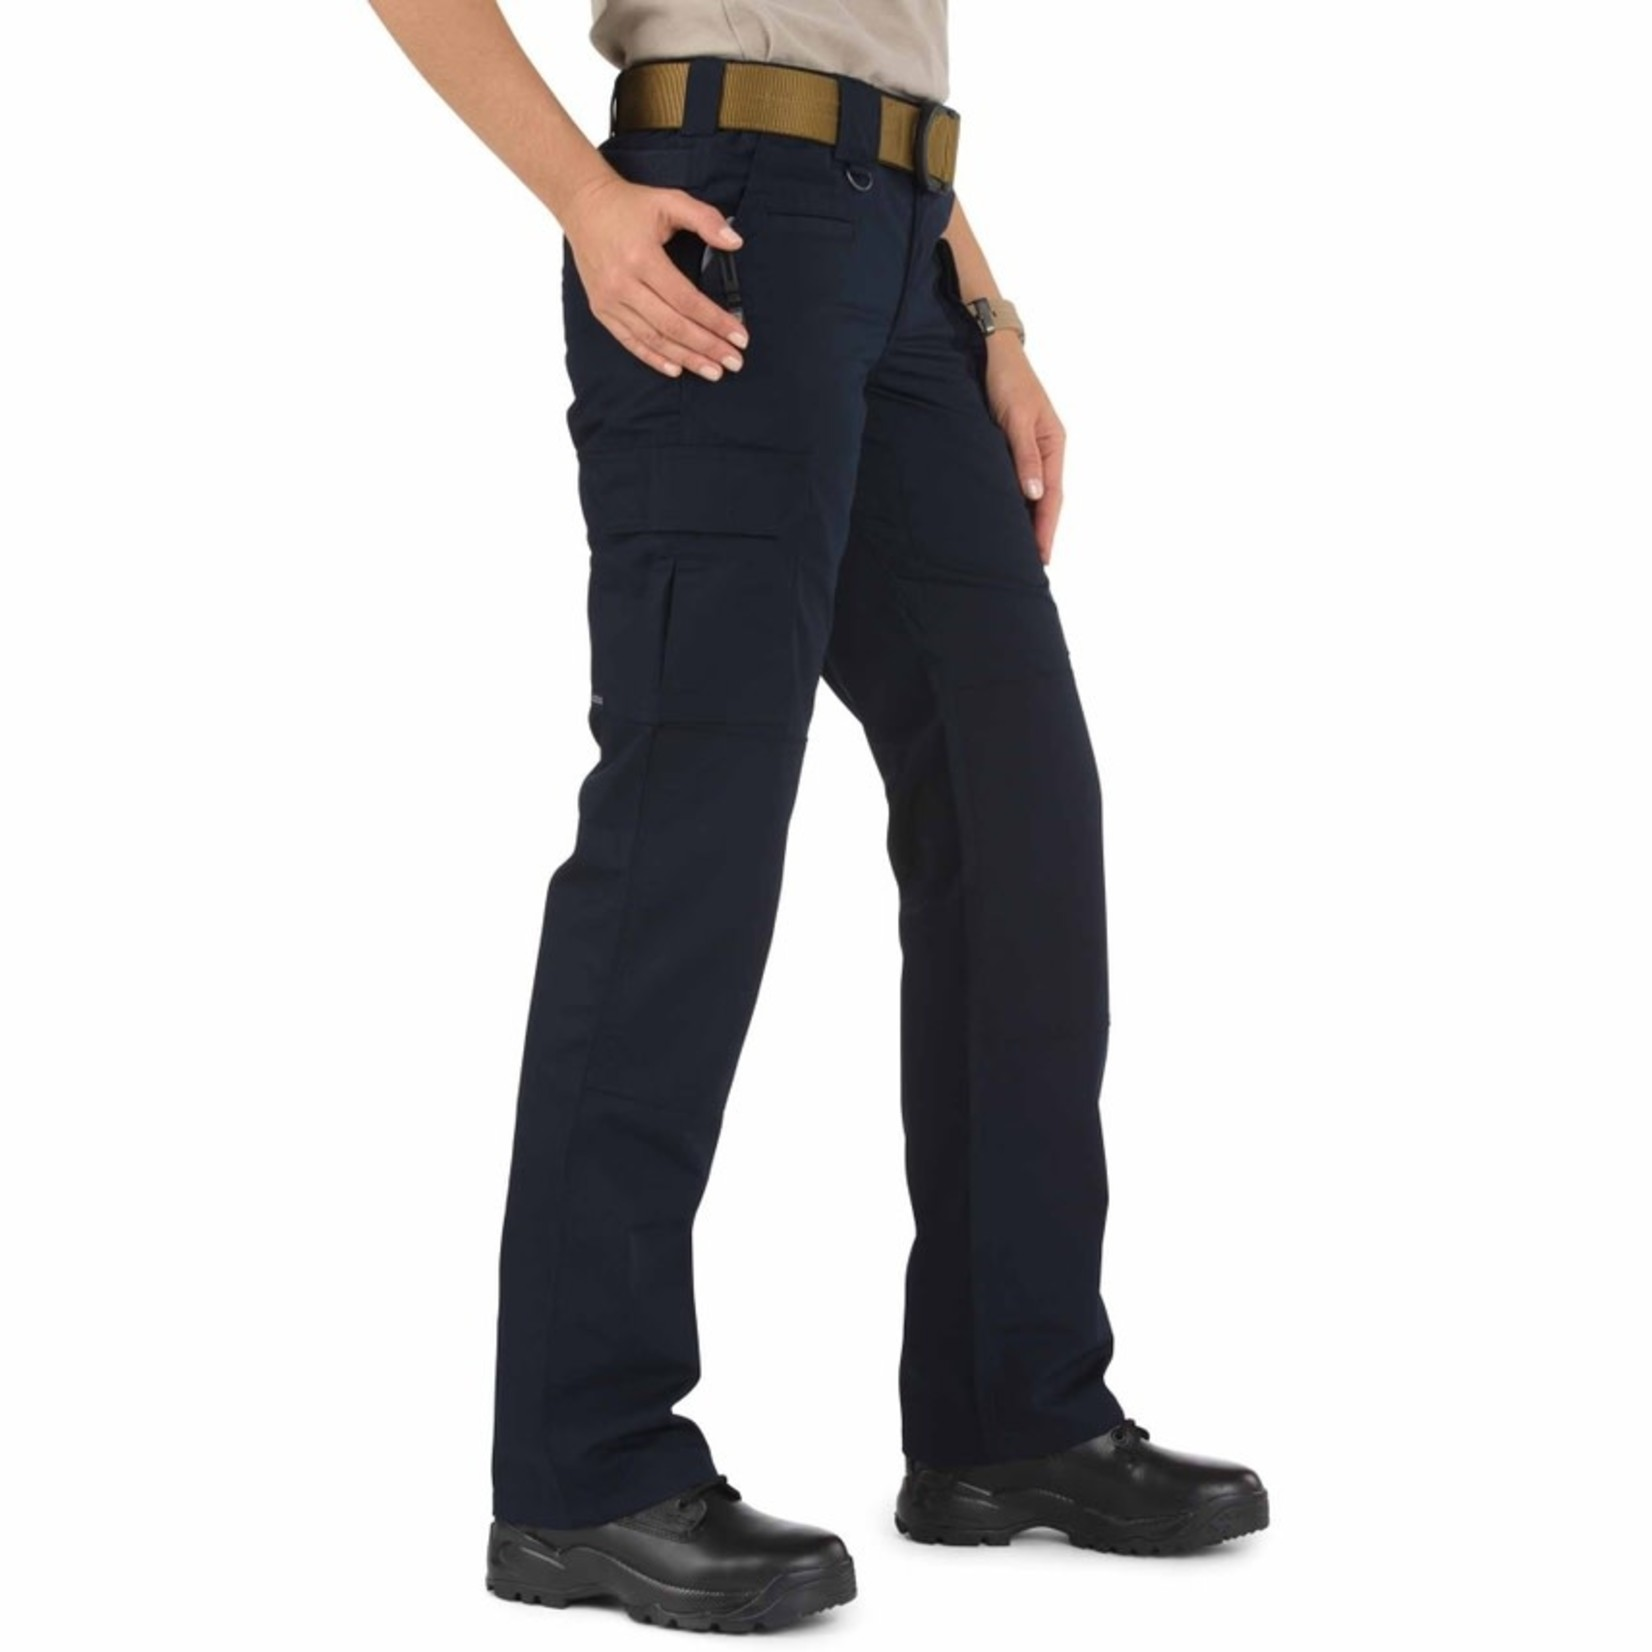 5.11 Tactical 5.11 Women's Taclite Pro Pants